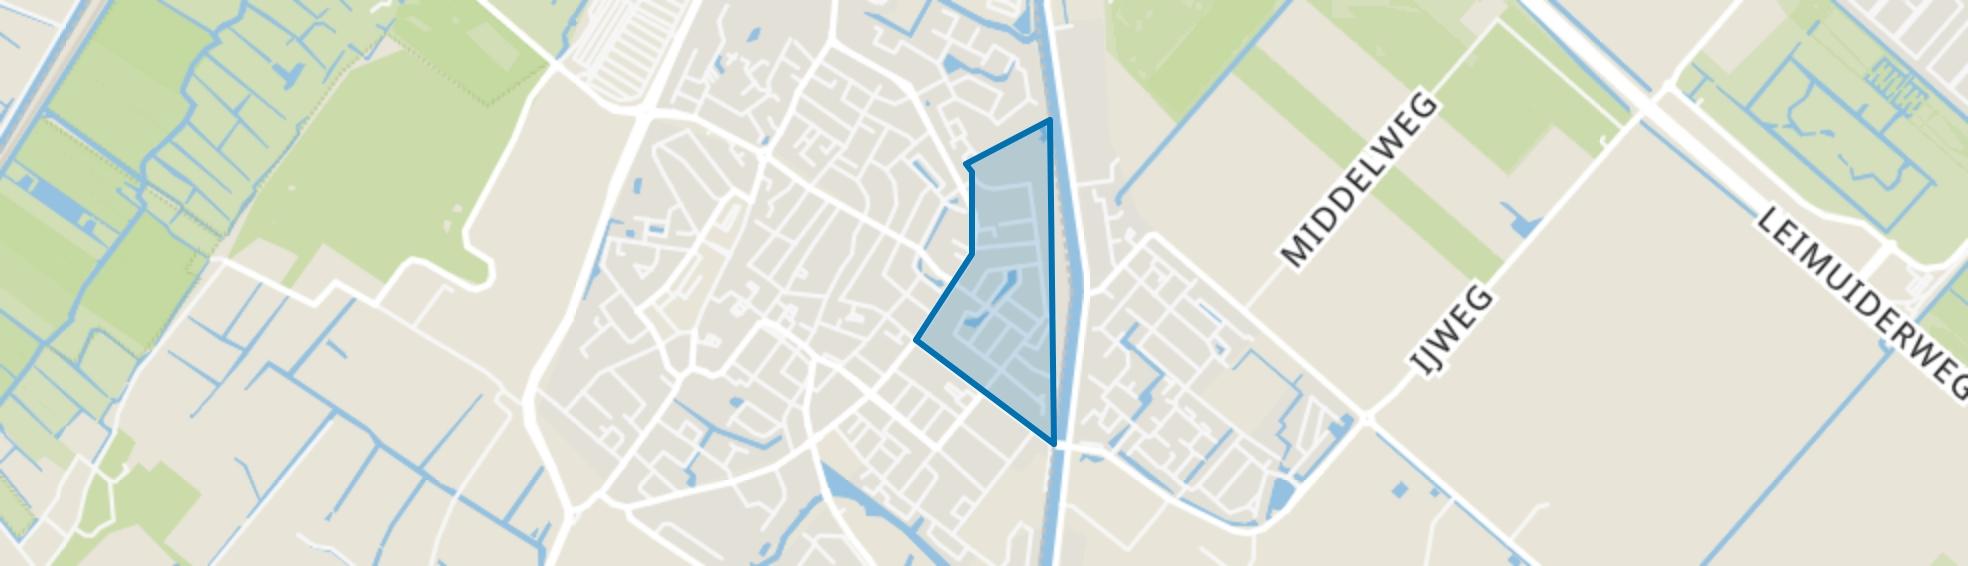 Zeeheldenbuurt, Lisse map